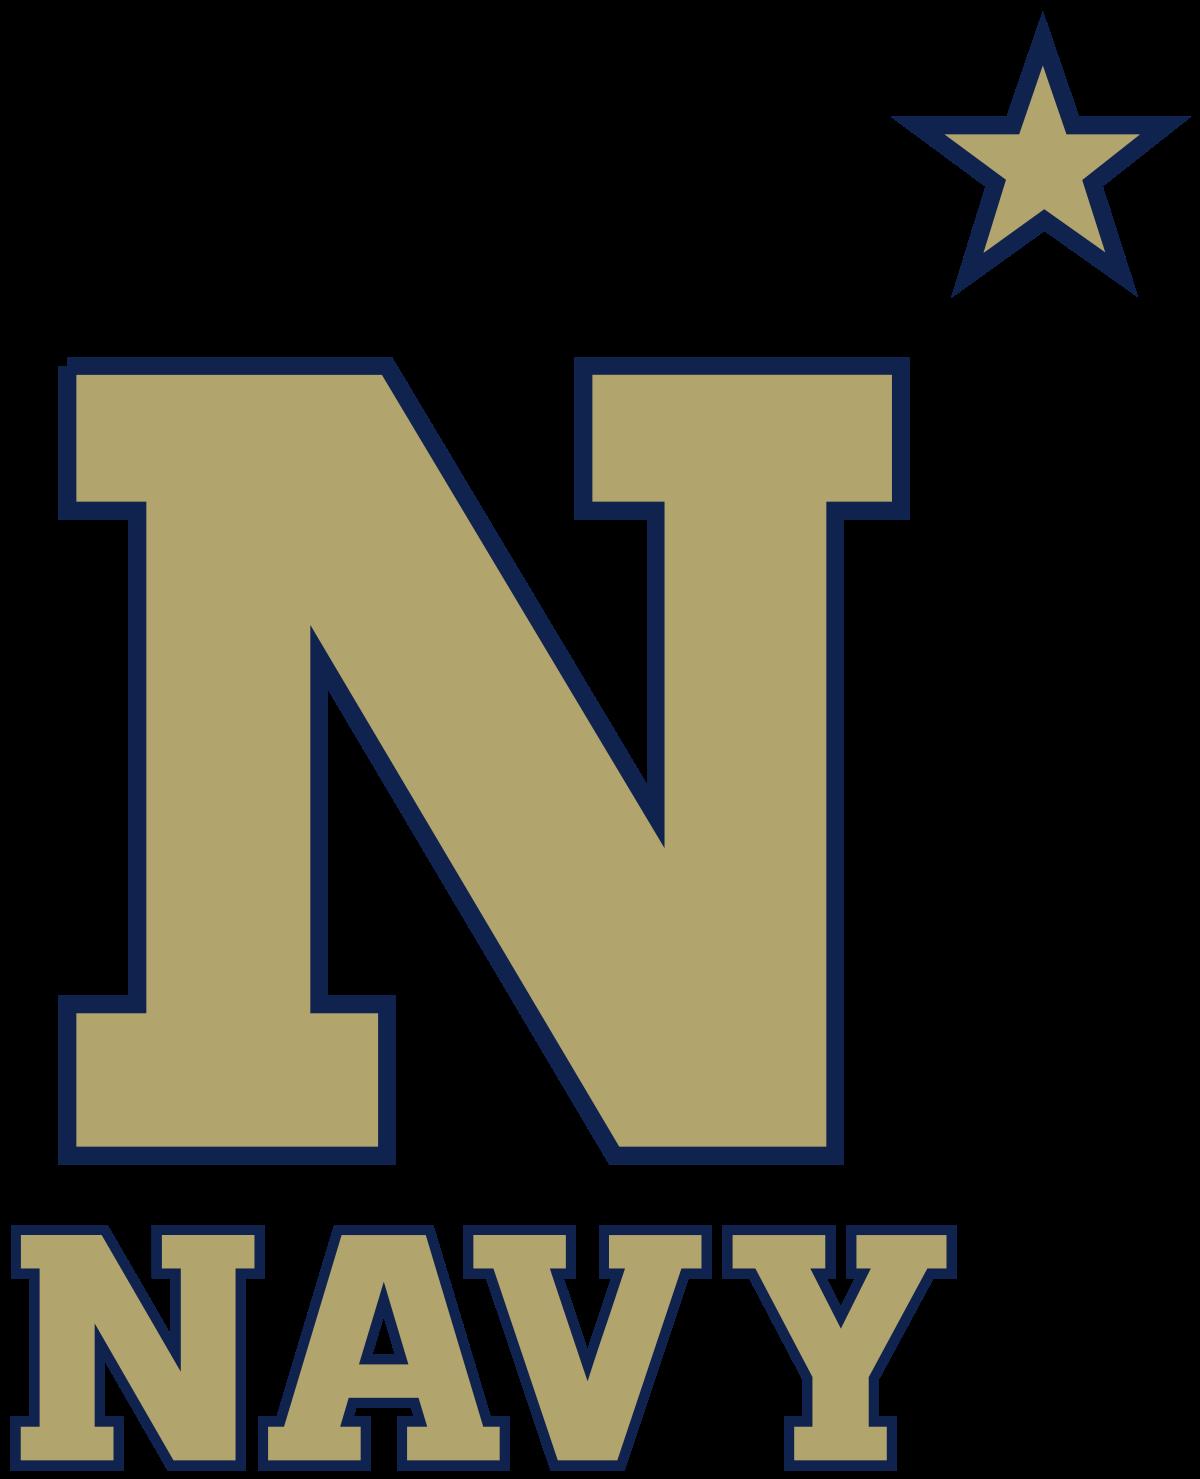 Navy Notre Dame Football Rivalry Wikipedia